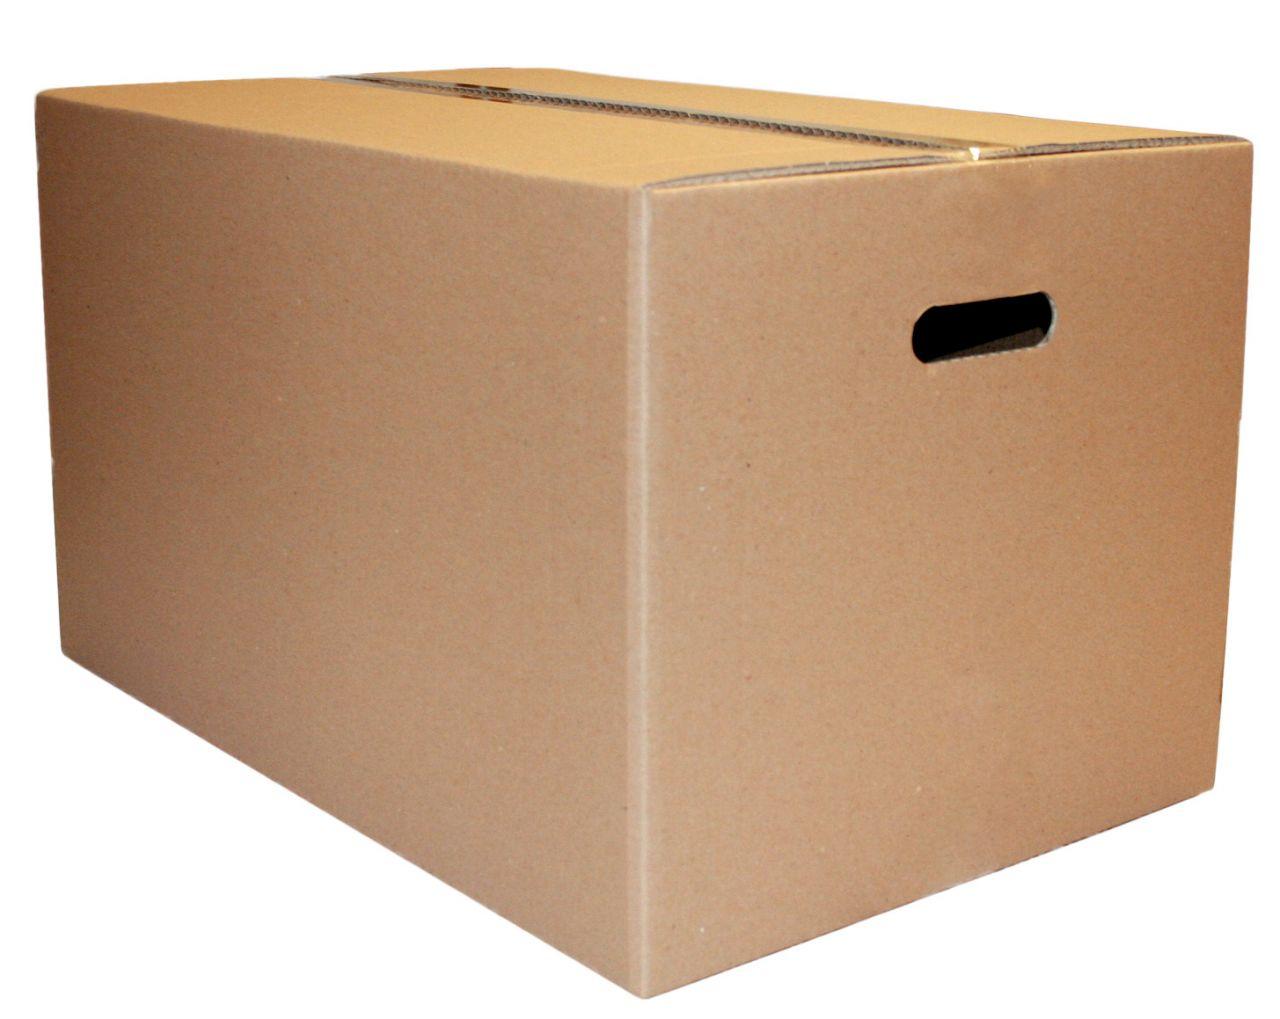 Csomagoló doboz TFL 600*400*400 mm, 5r., 10 db/köteg